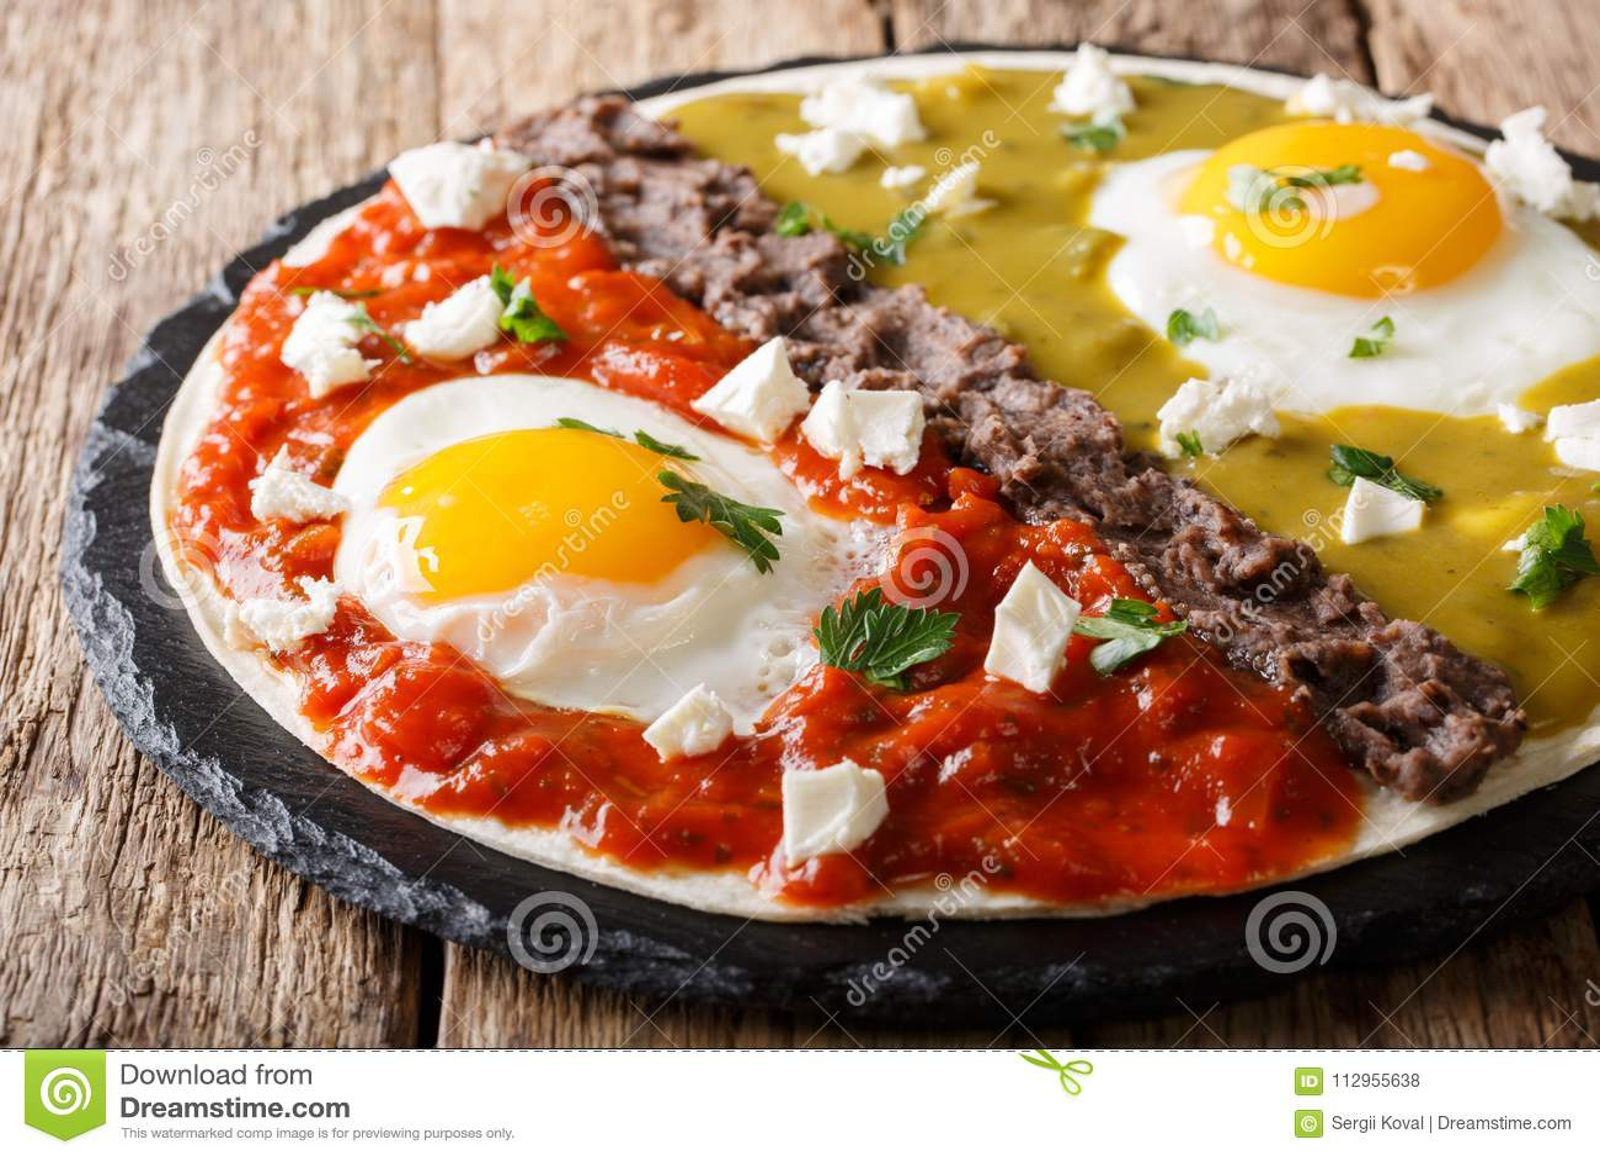 Home Mexican food: huevos divorciados with Frijoles refritos, two sauces roja and verde and cheese Queso Fresco on tortilla macro